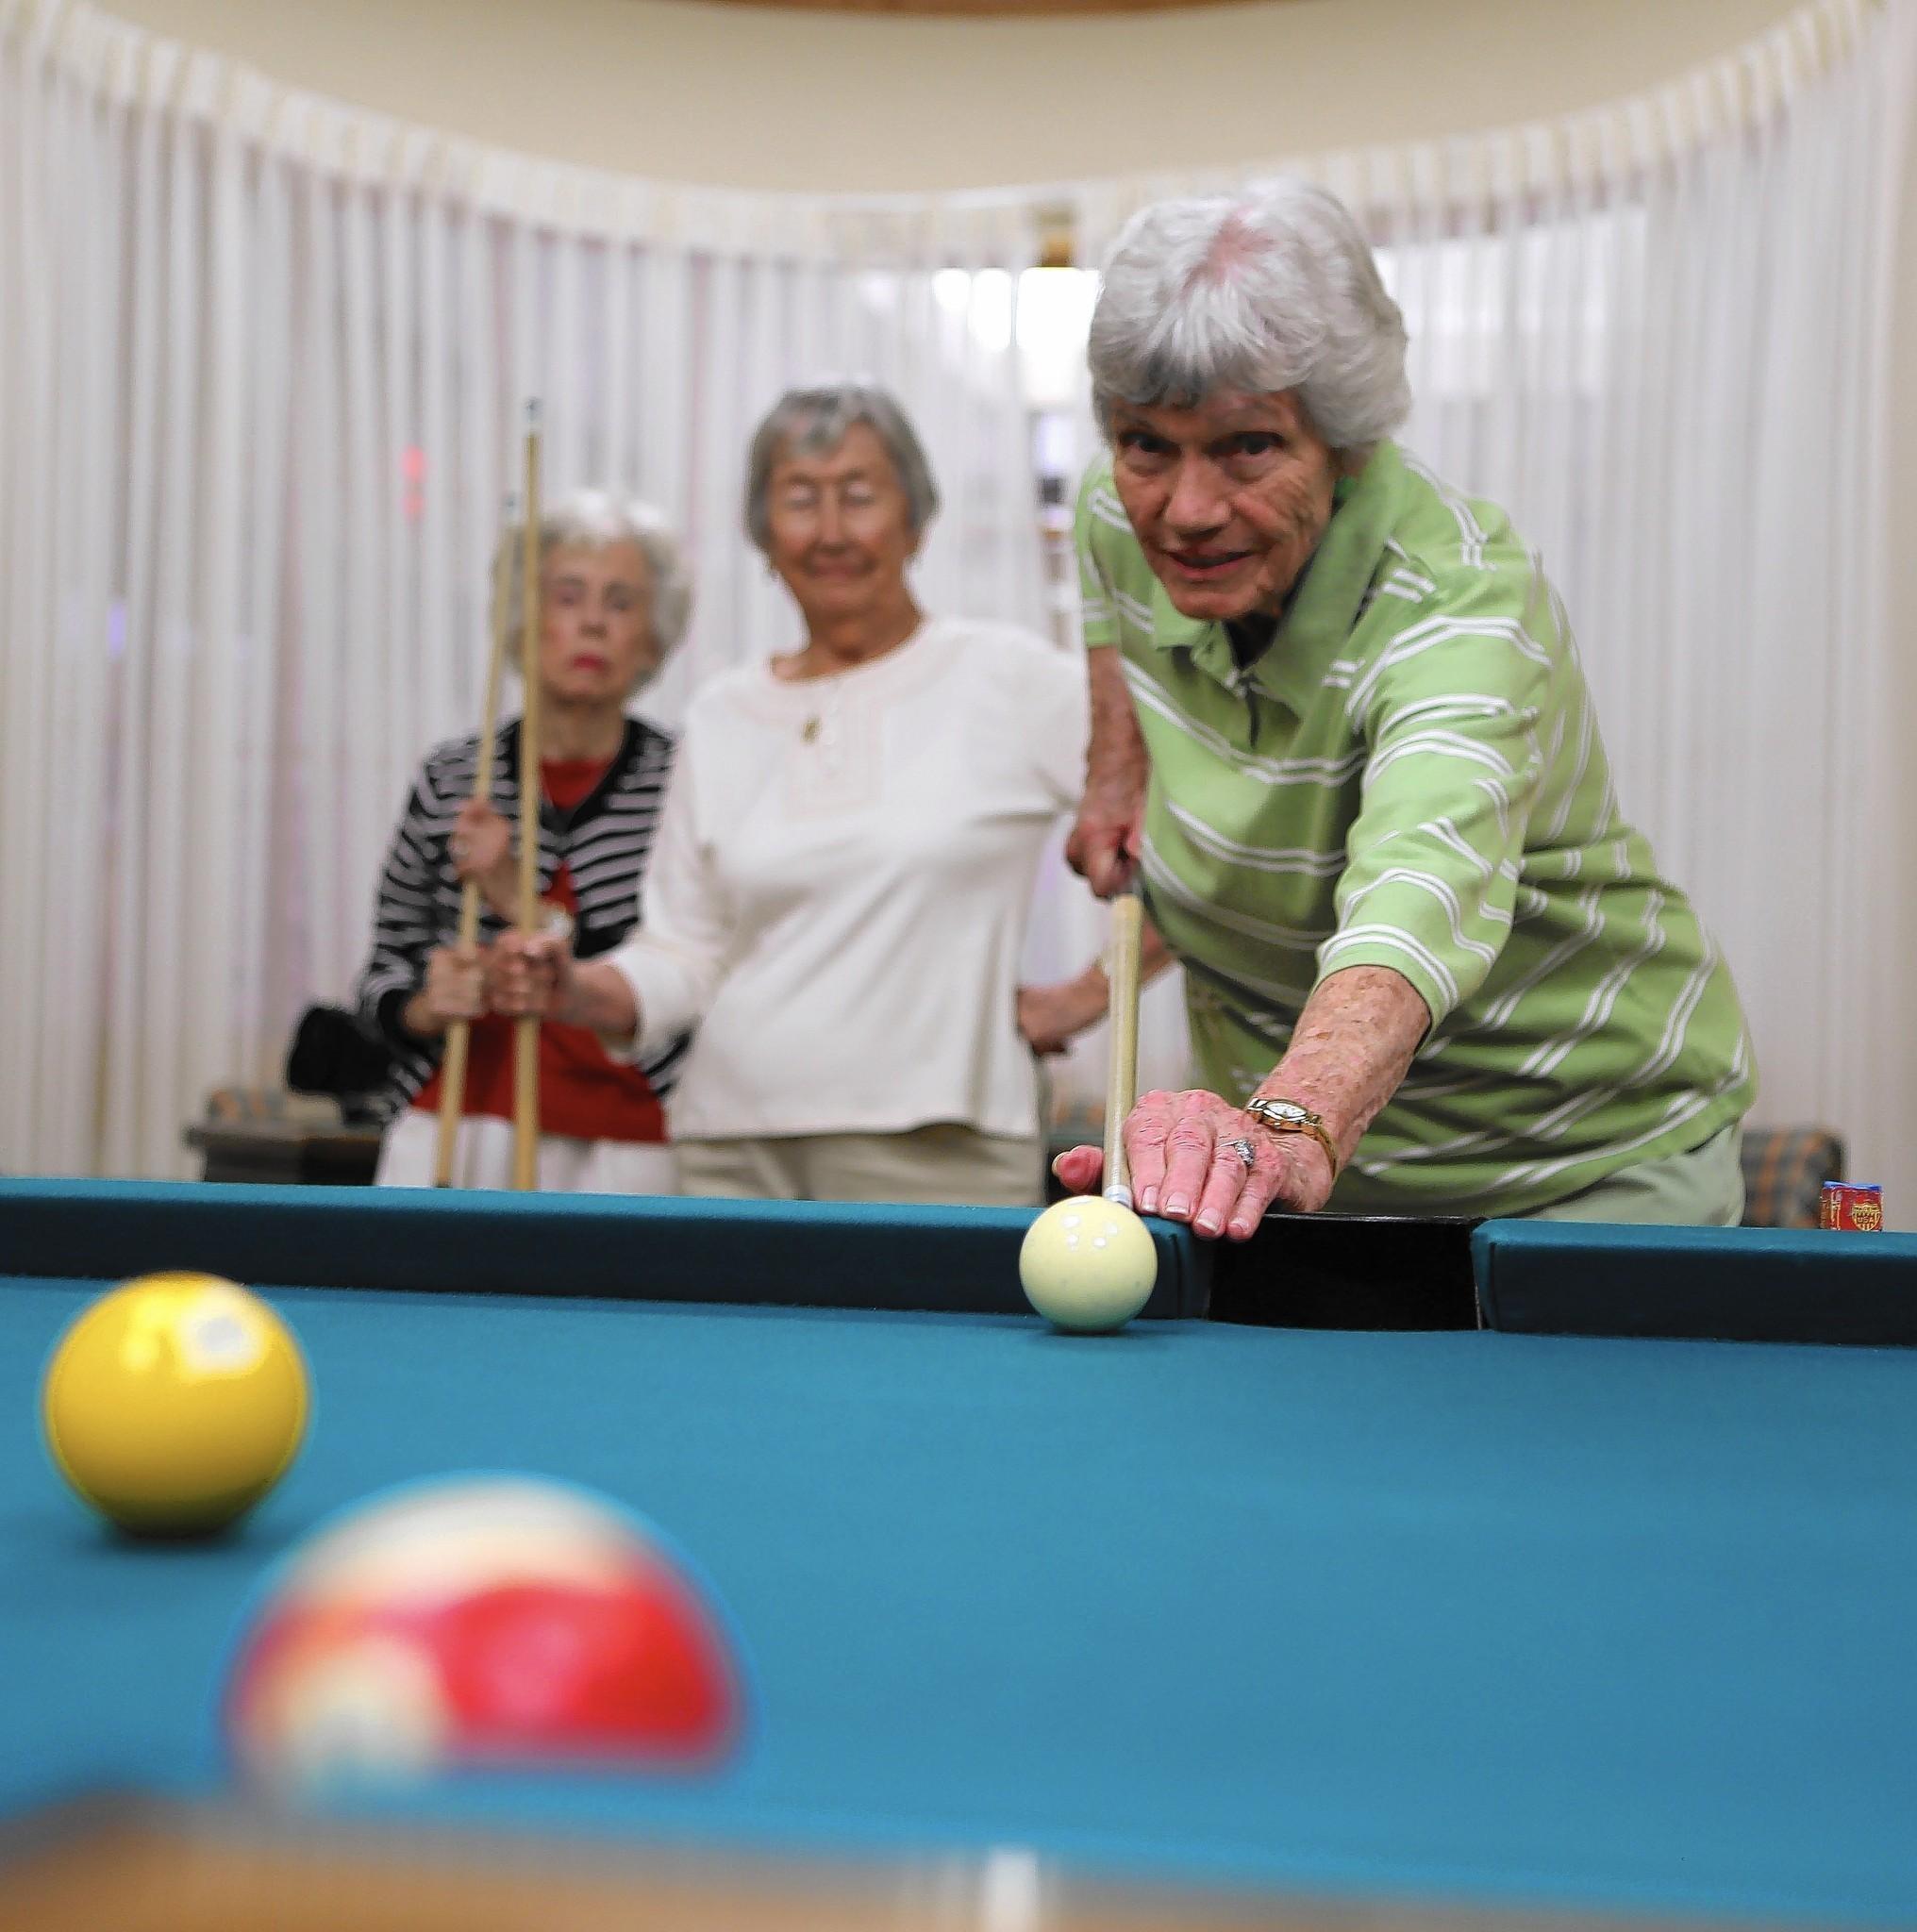 Senior Women Make A Splash At The Pool Tables At Village